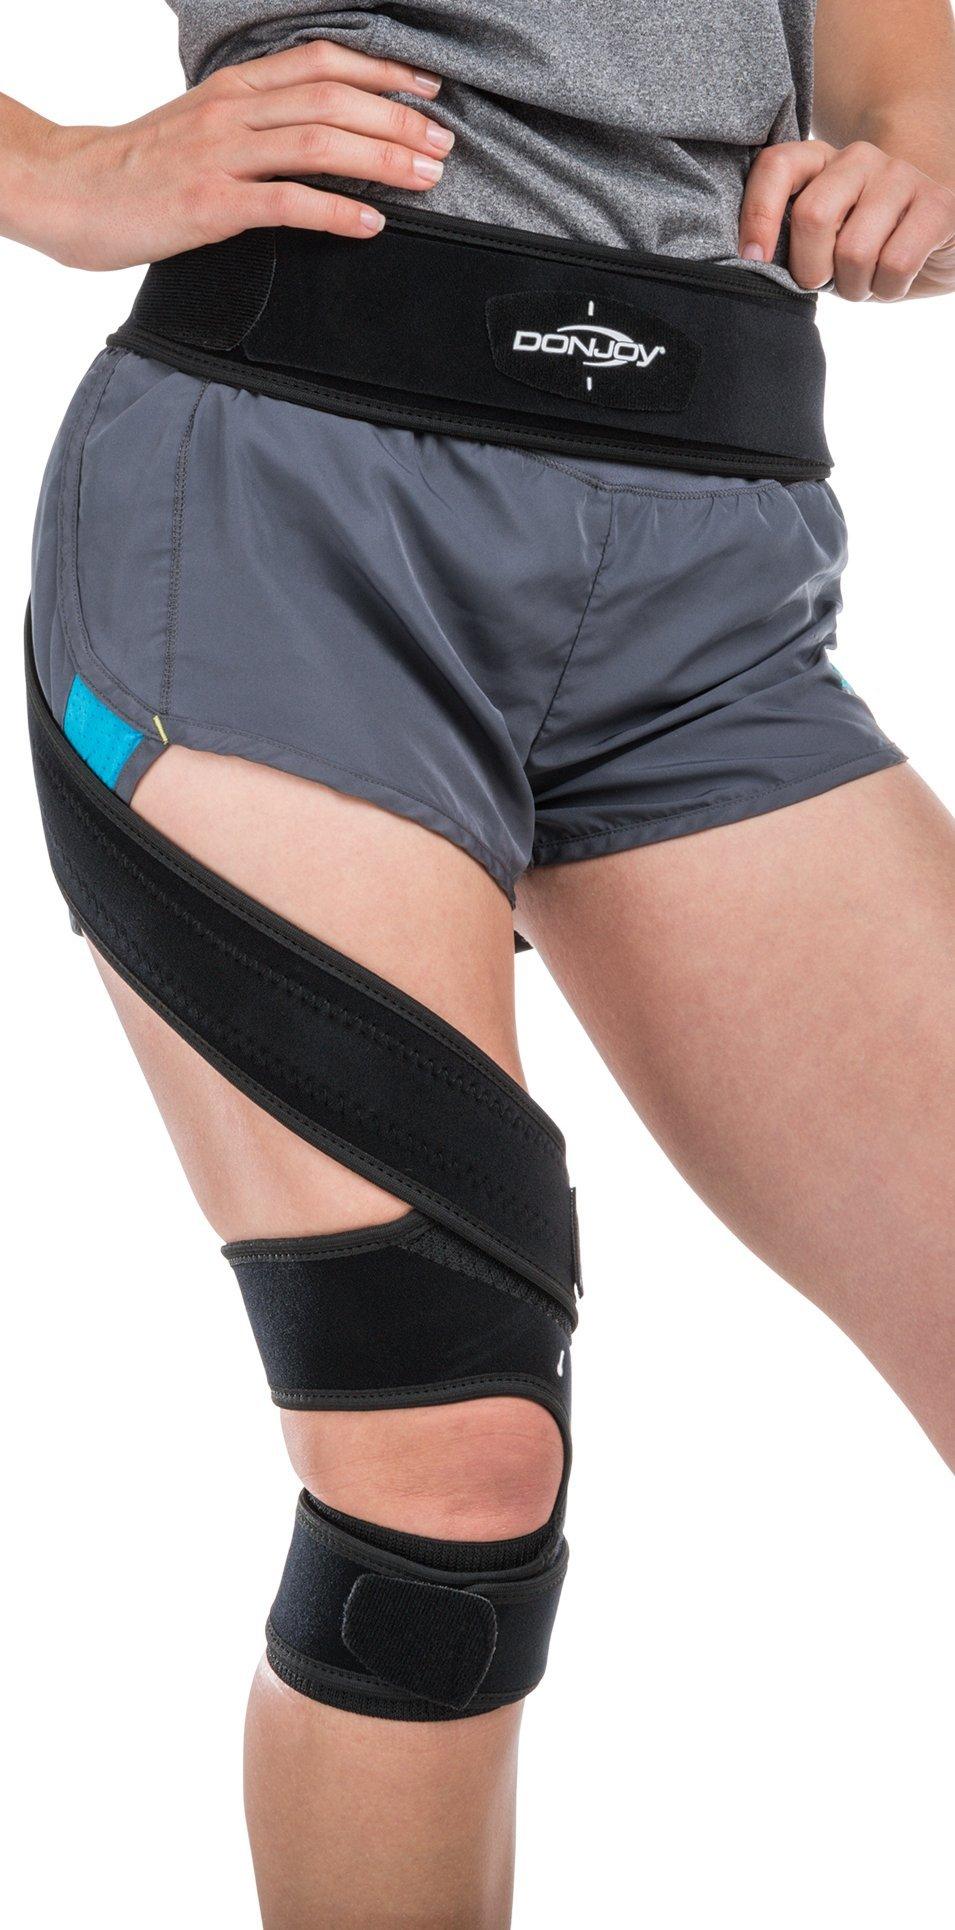 DonJoy S.E.R.F. Patellofemoral Brace Support Strap, Right Leg, Medium by DonJoy